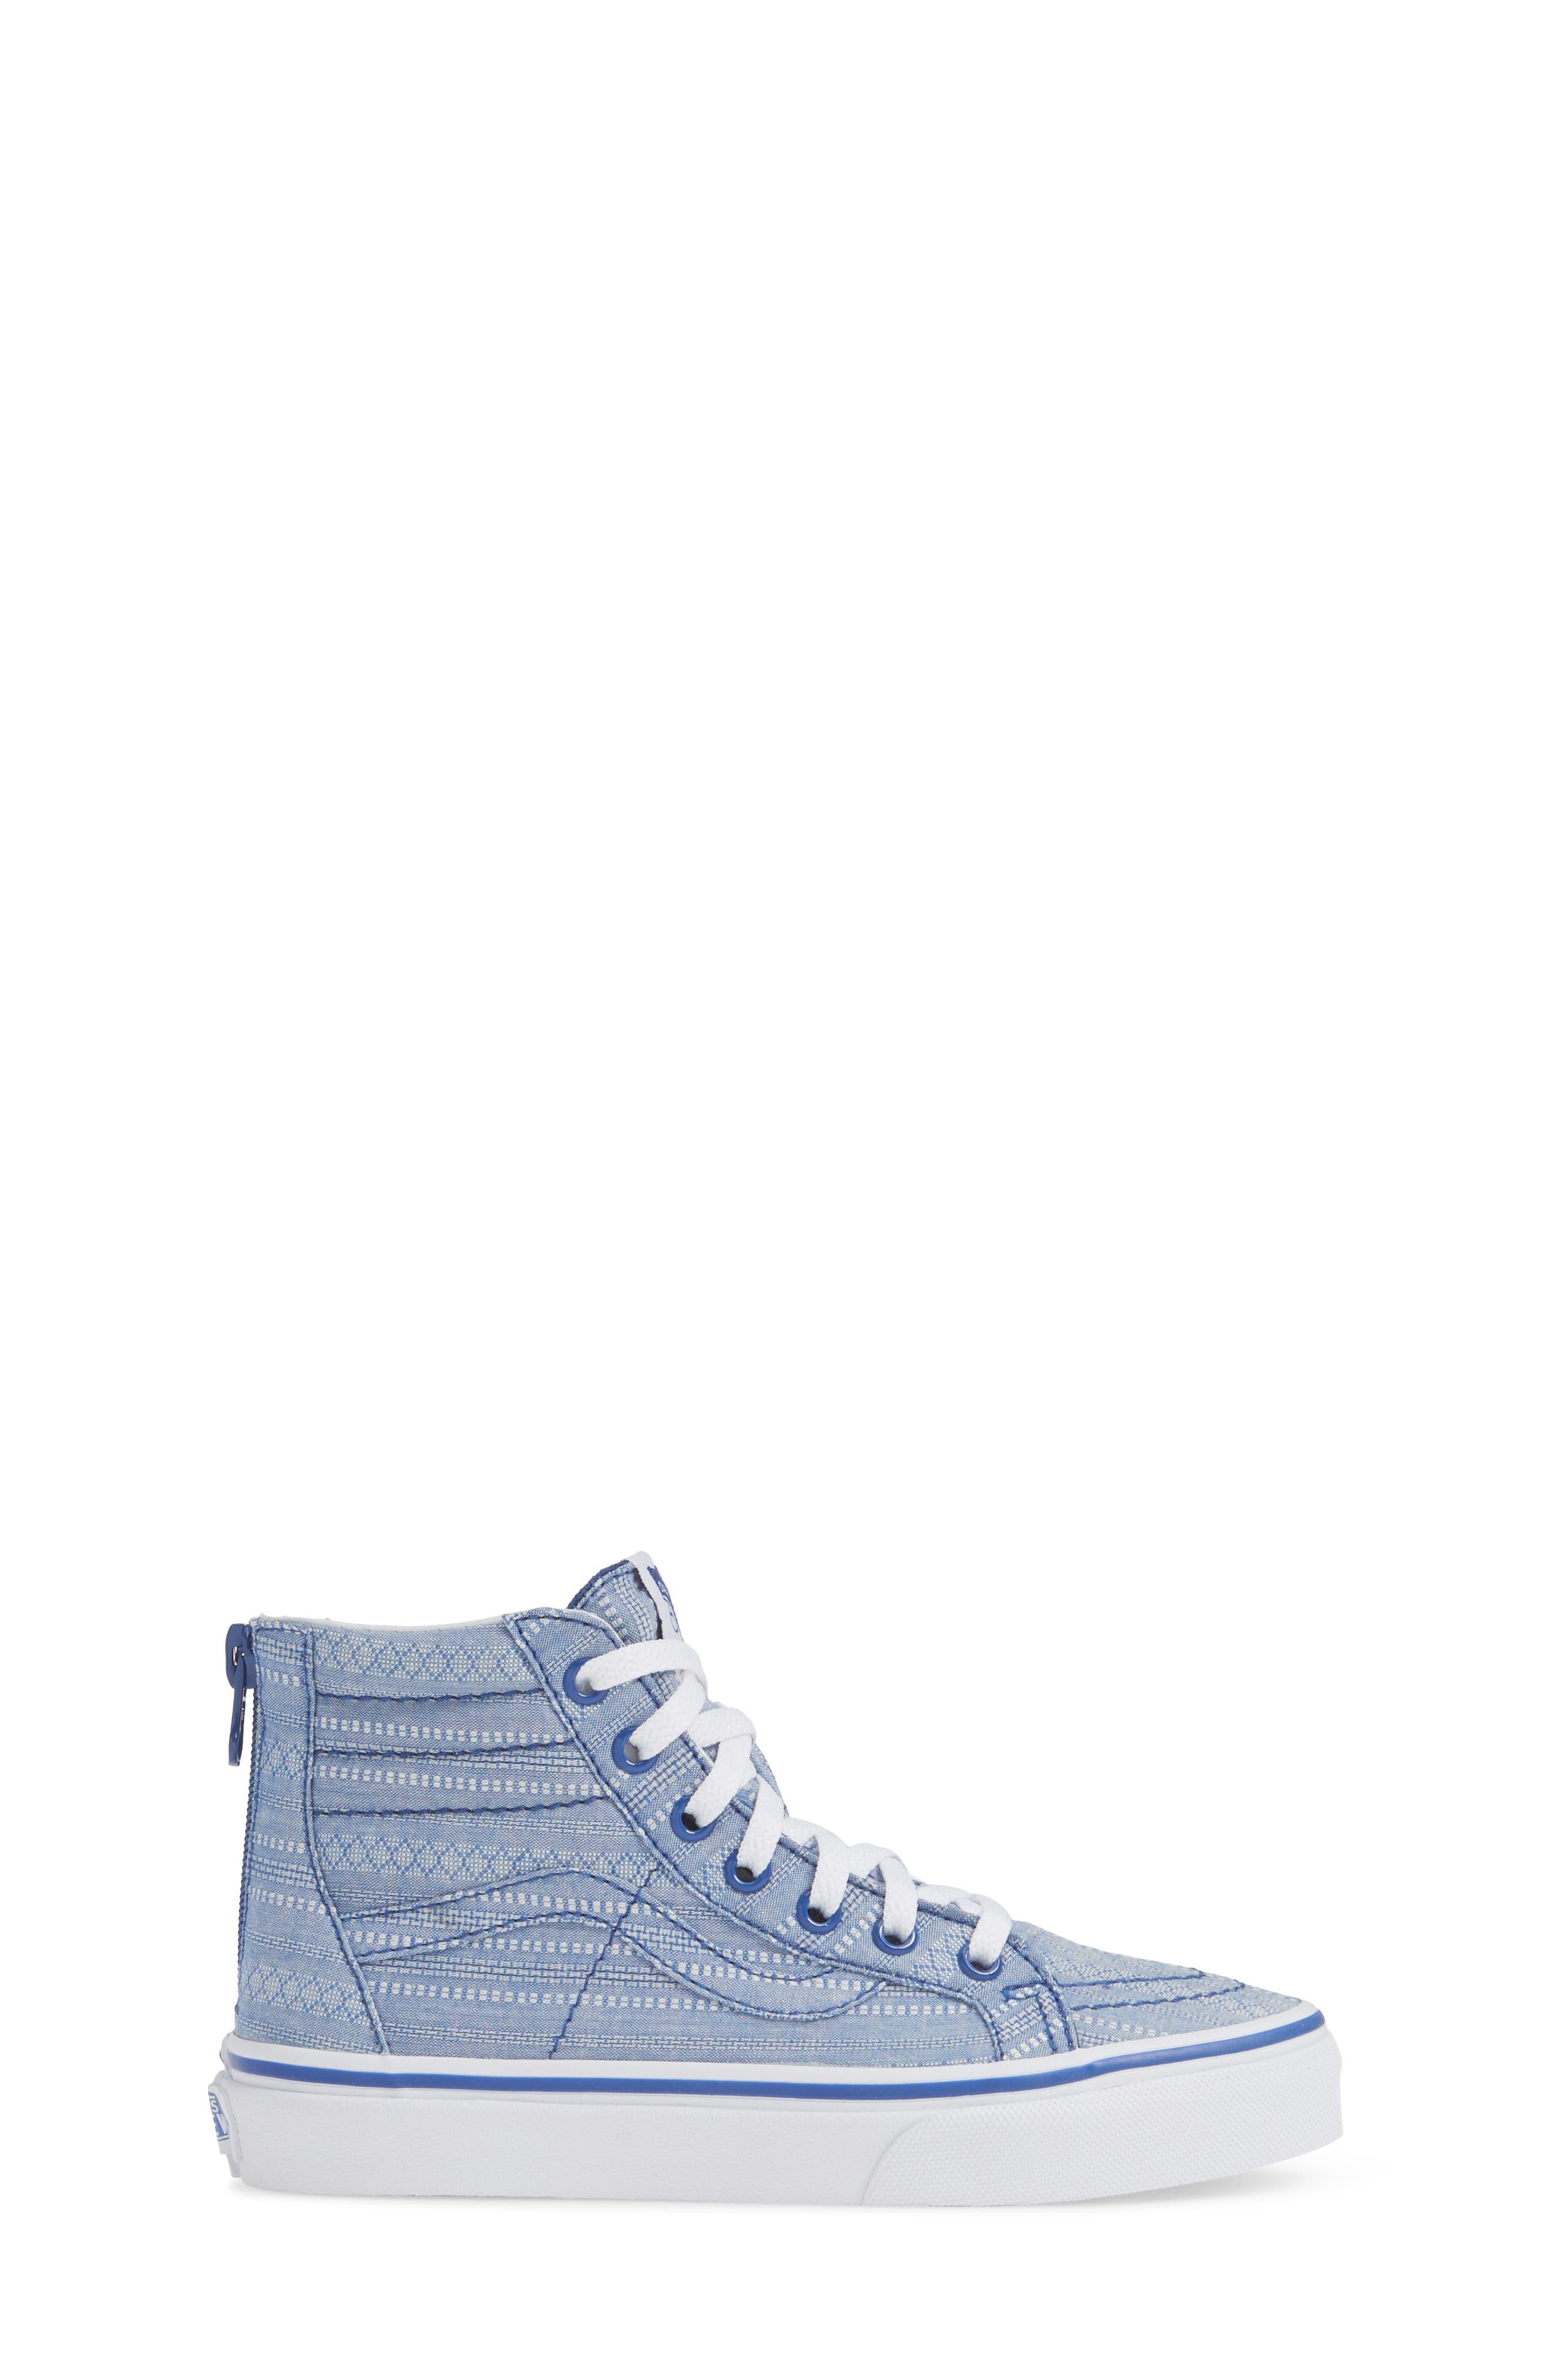 VANS, Sk8-Hi Zip Sneaker, Alternate thumbnail 3, color, TRUE BLUE/ TRUE WHITE